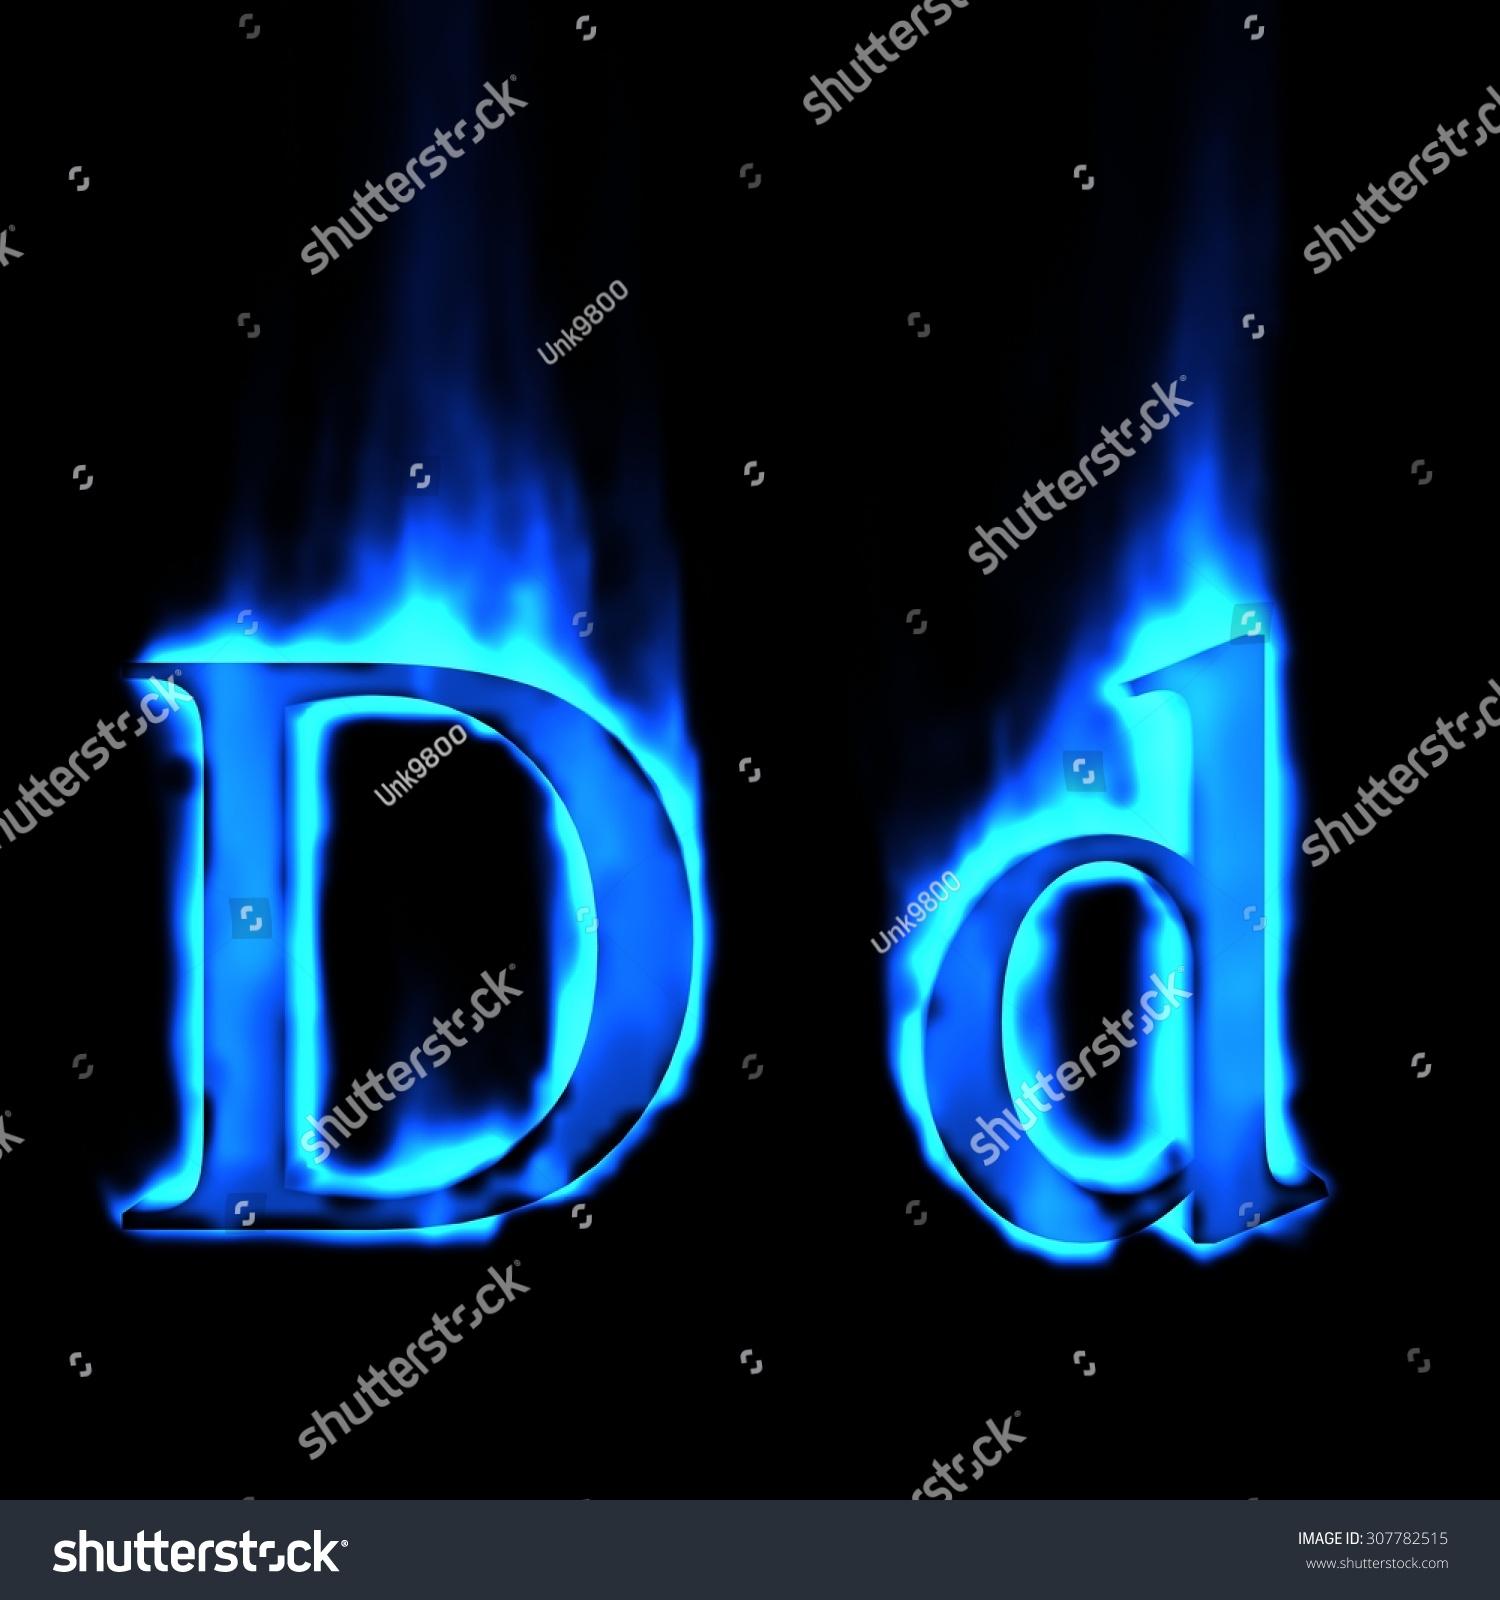 Font Magic Letter Flame I Blue